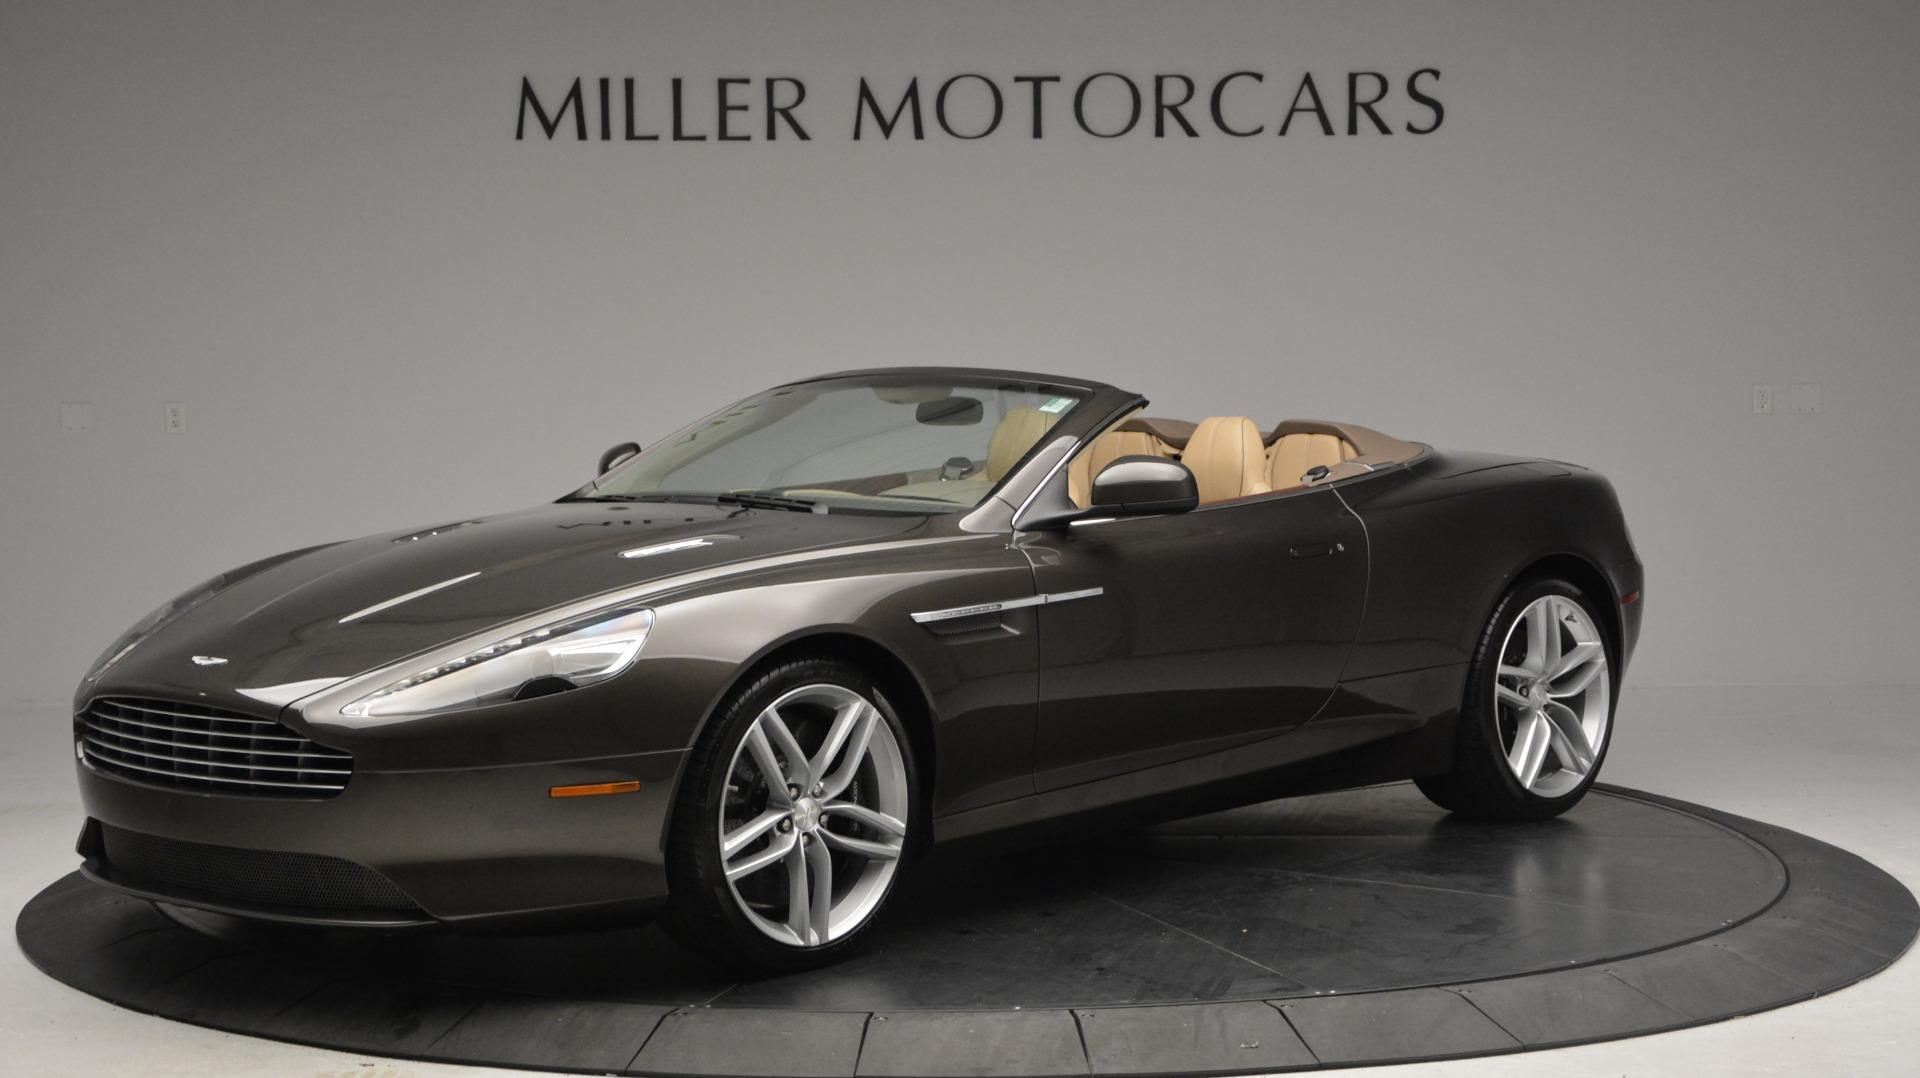 Used 2012 Aston Martin Virage Convertible For Sale In Greenwich, CT. Alfa Romeo of Greenwich, 7613 3351_main